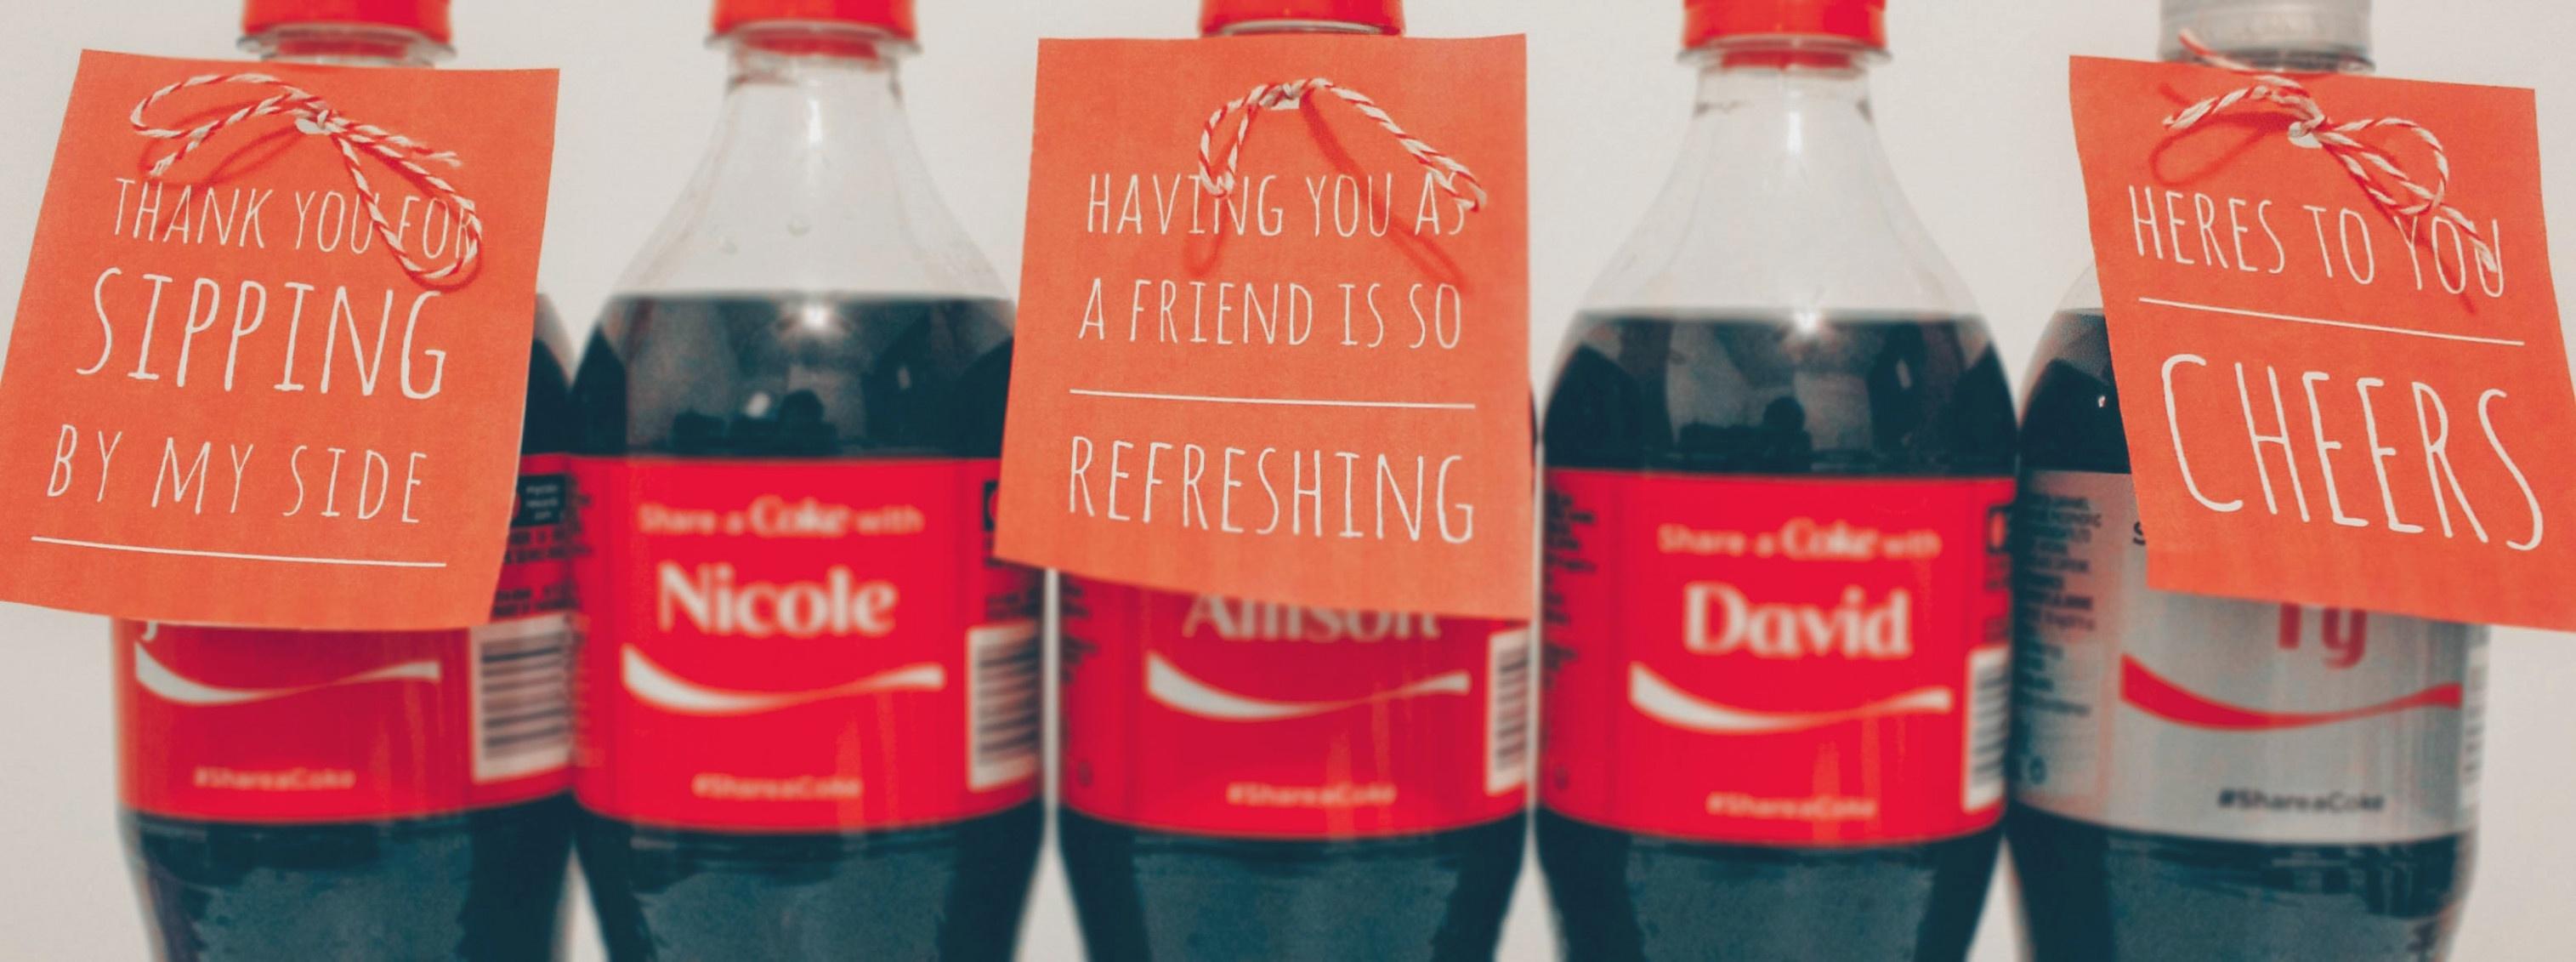 Free Printable Soda Vending Machine Labels A Coke Printable S To - Free Printable Soda Vending Machine Labels